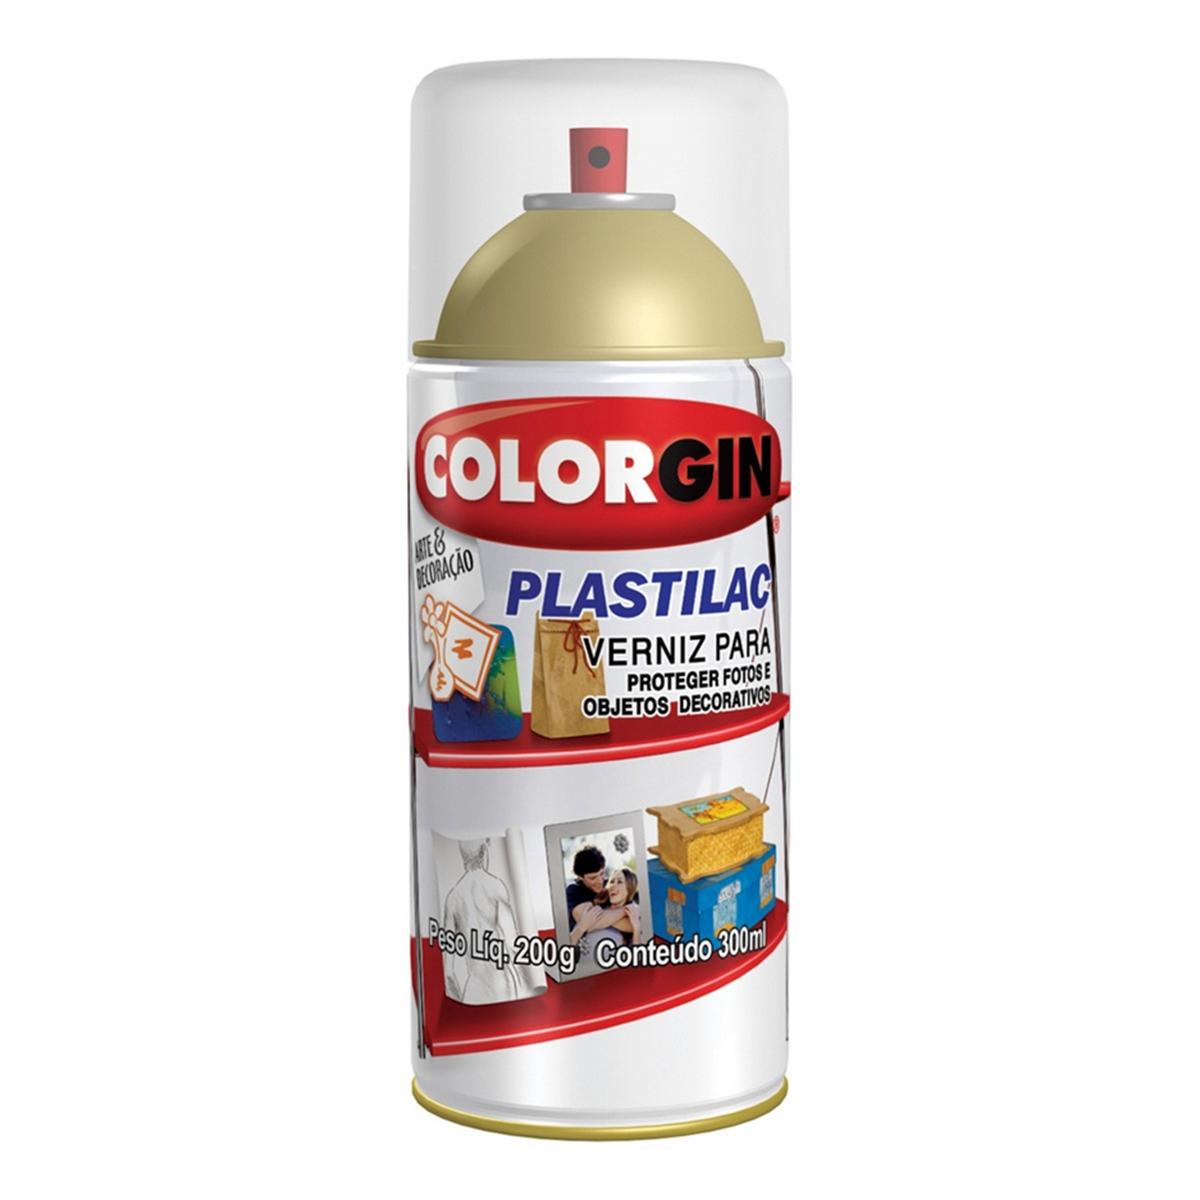 Verniz Spray Colorgin Plastilac – Incolor Brilhante 300ml